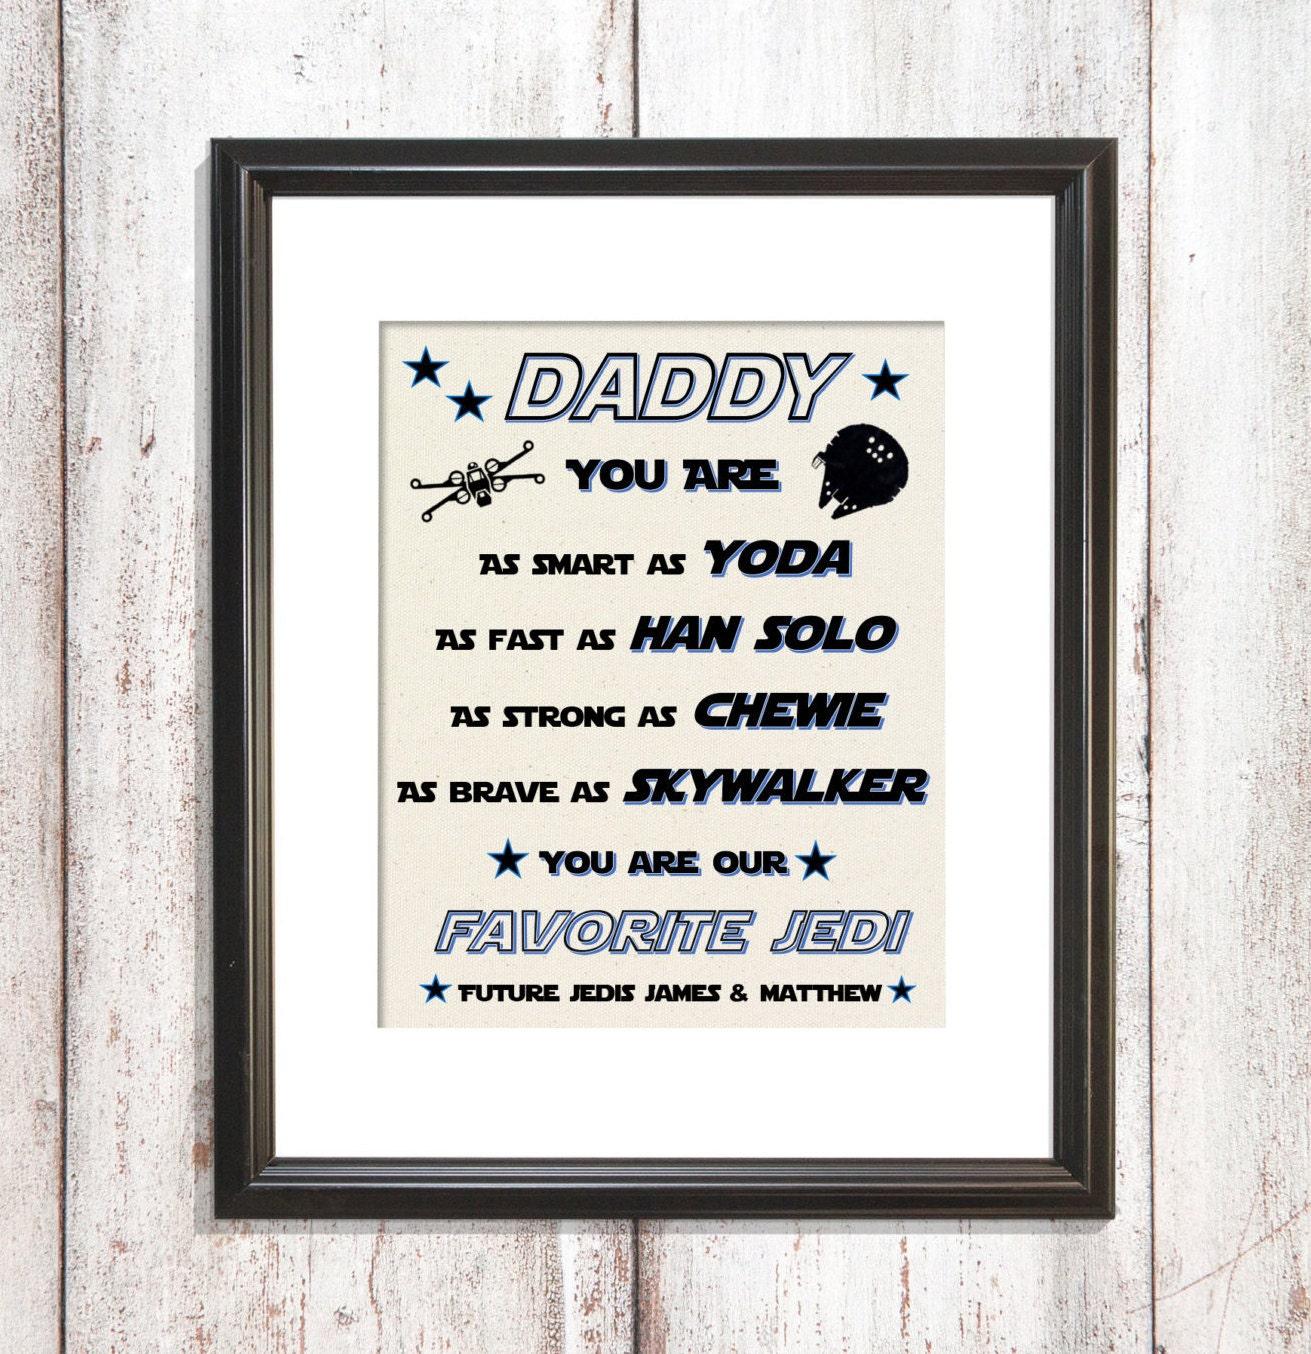 Dad Star Wars Gift Star wars christmas gift Husband | Etsy